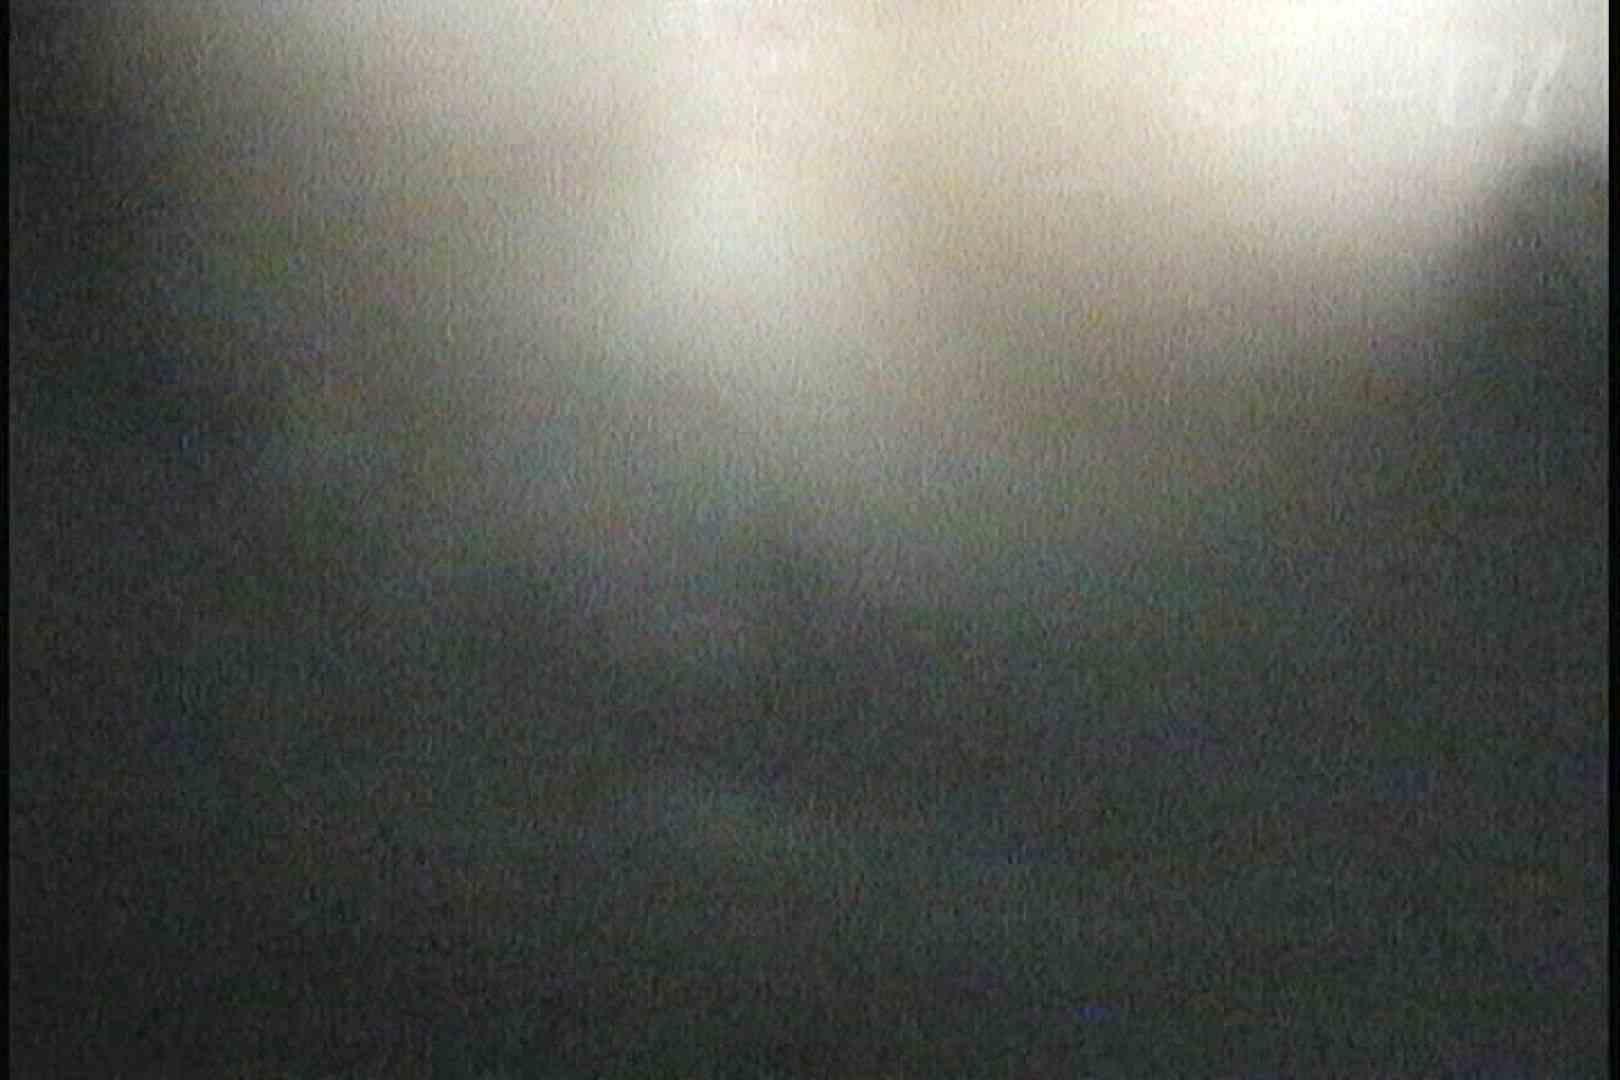 No.3 金髪ギャル 薄い陰毛の奥は一本スジが。 ギャル ワレメ無修正動画無料 49連発 38